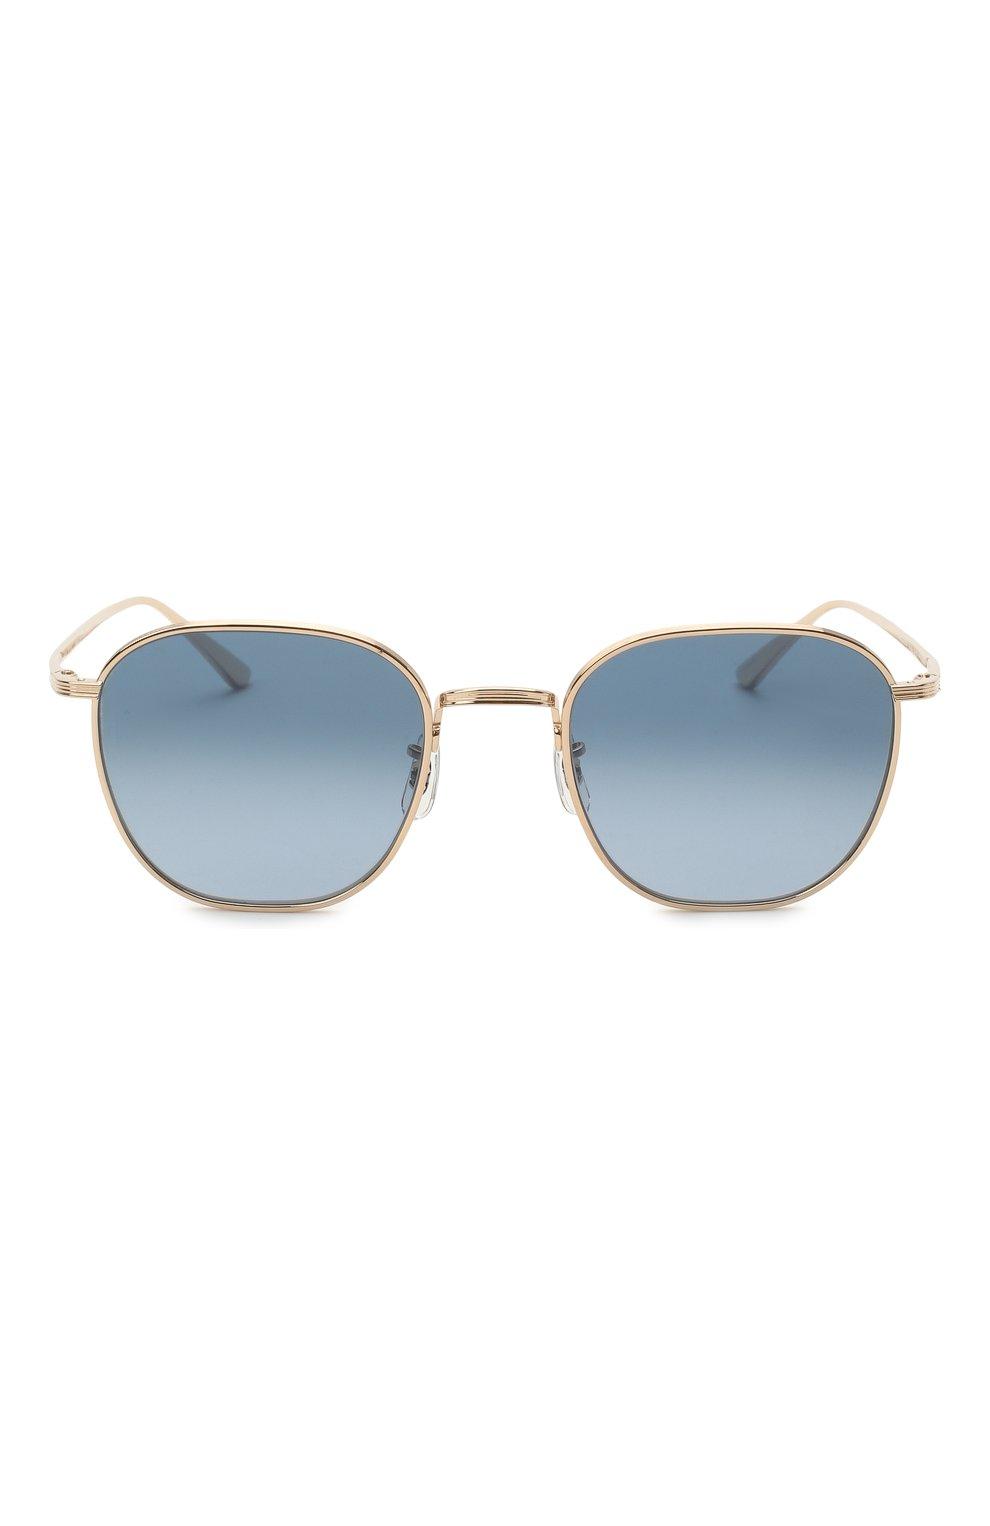 Женские солнцезащитные очки THE ROW X OLIVER PEOPLES синего цвета, арт. 1230ST-5035Q8 | Фото 4 (Тип очков: С/з; Очки форма: Круглые; Оптика Гендер: оптика-унисекс)